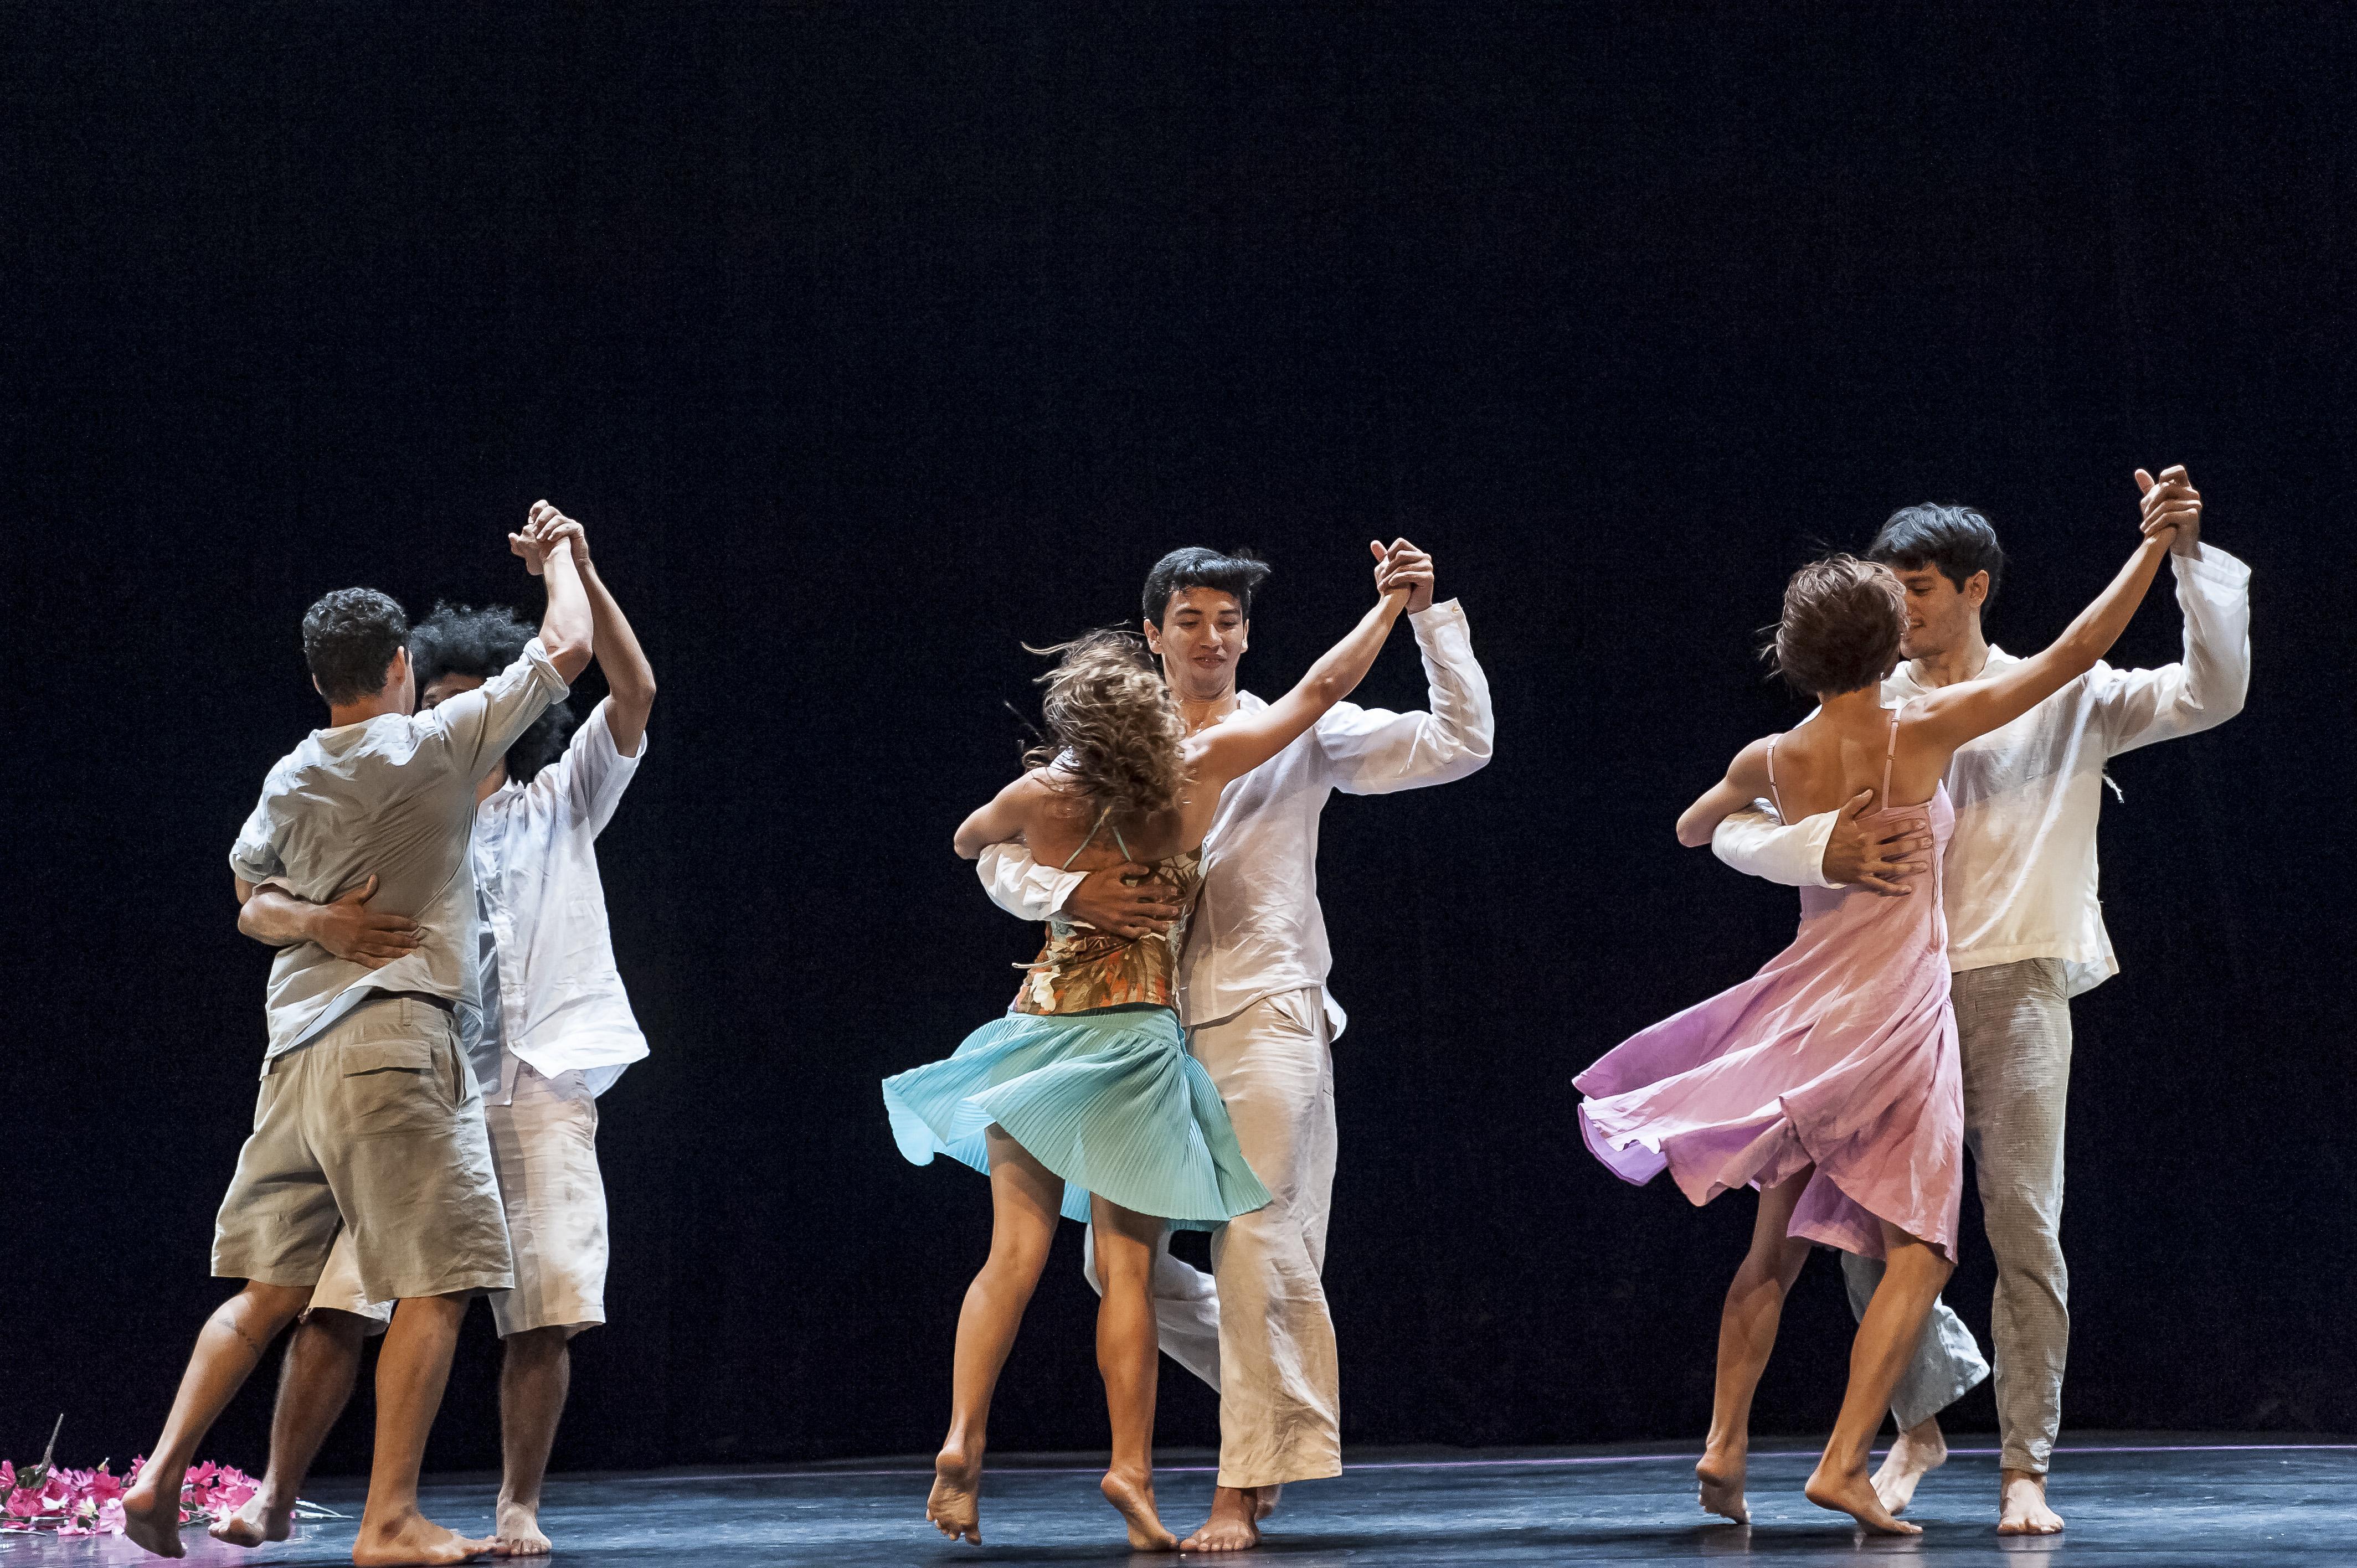 Paracuru recebe a XII Bienal de Dança